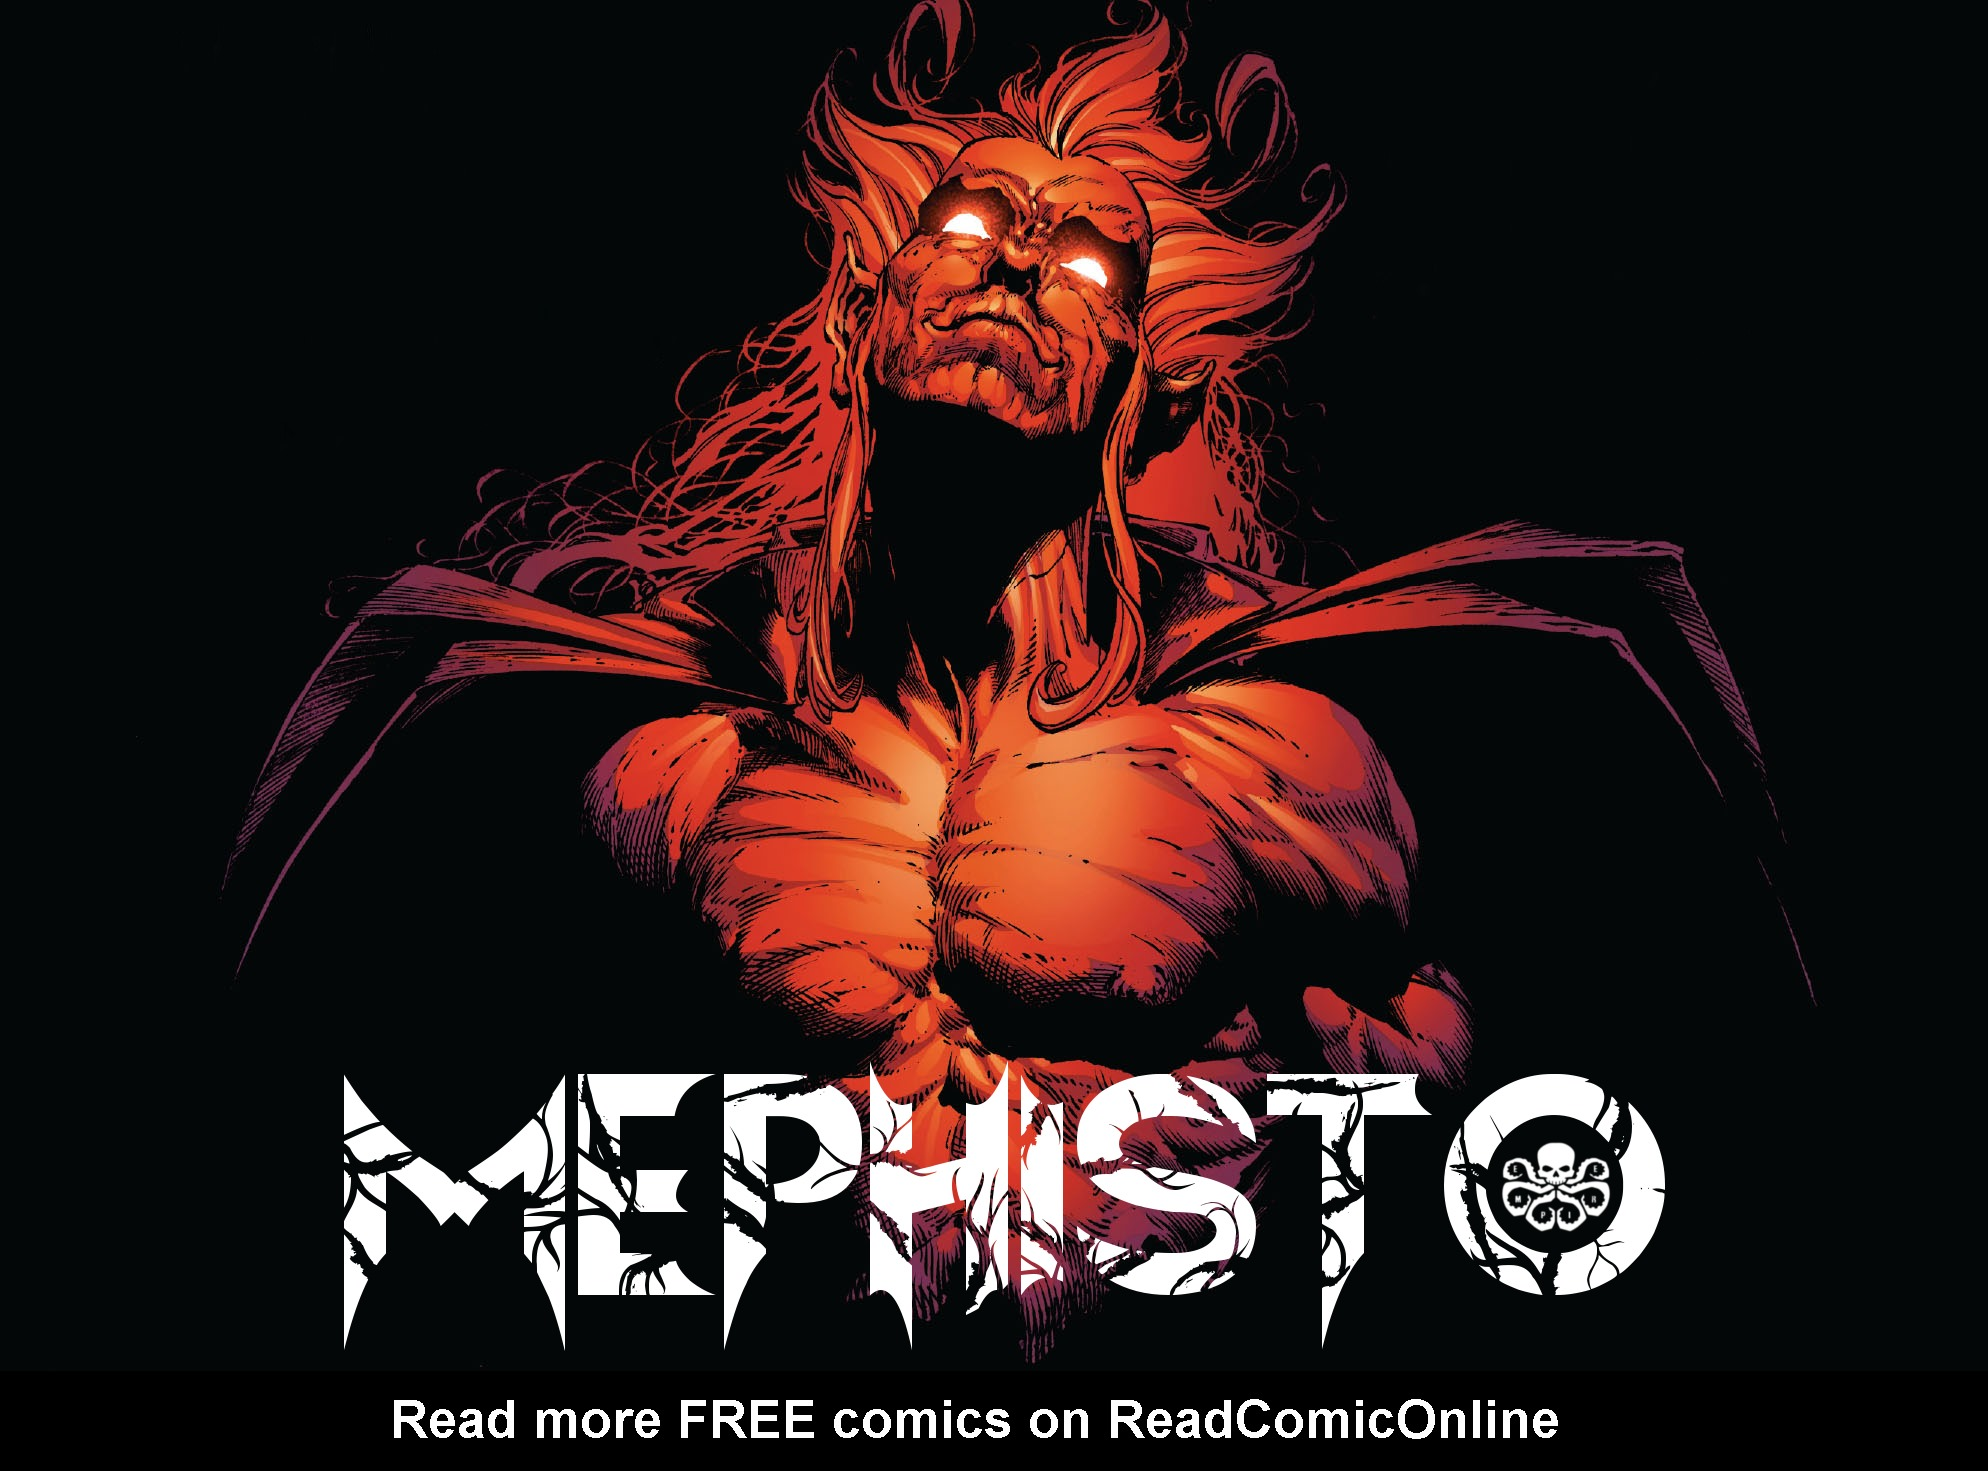 Read online Helena Crash comic -  Issue #4 - 38